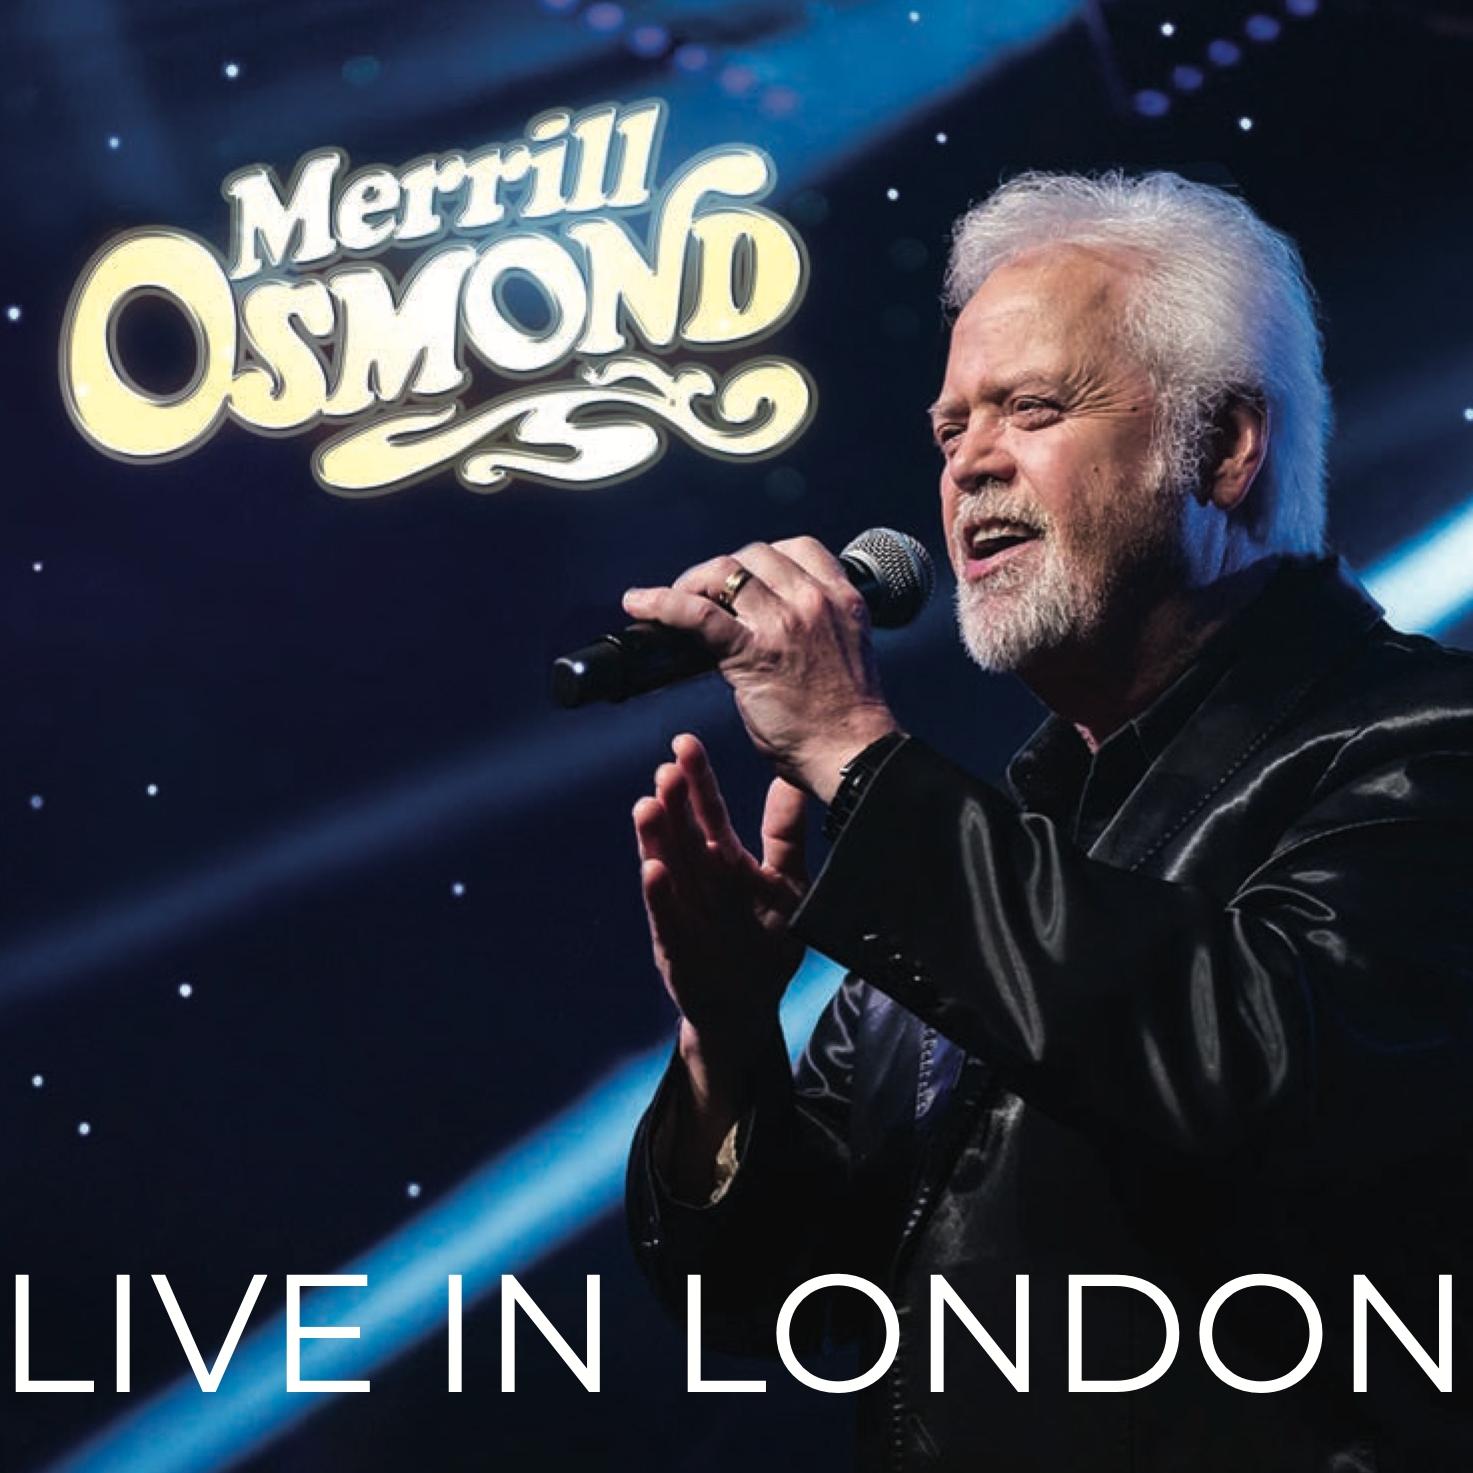 Merrill Osmond - Live In London